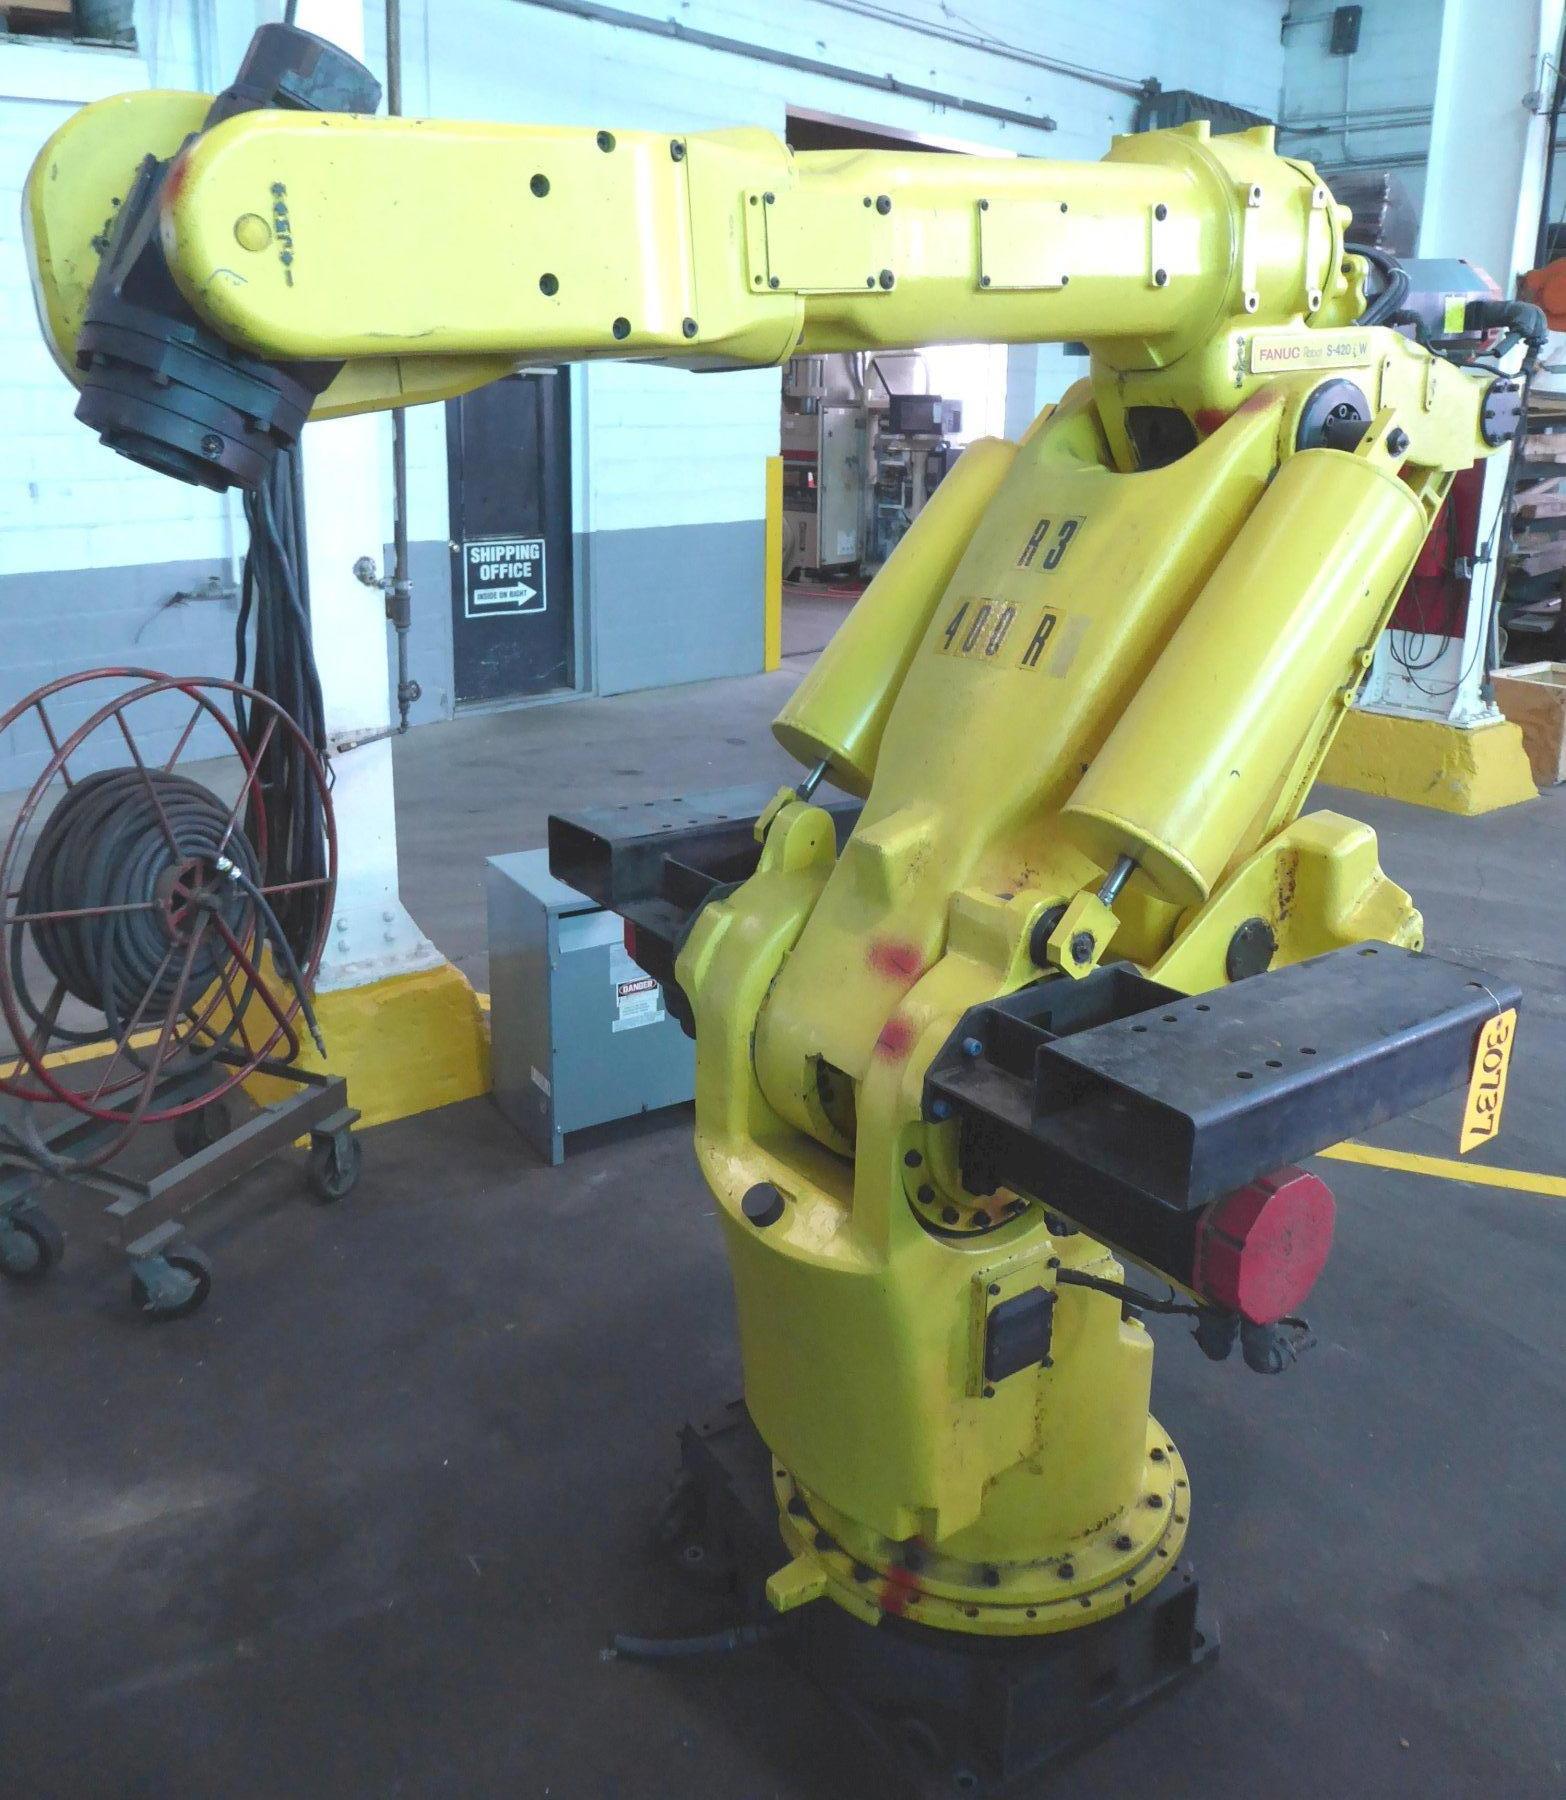 Fanuc Robot Model S-420 i W, System R-J2 Controller